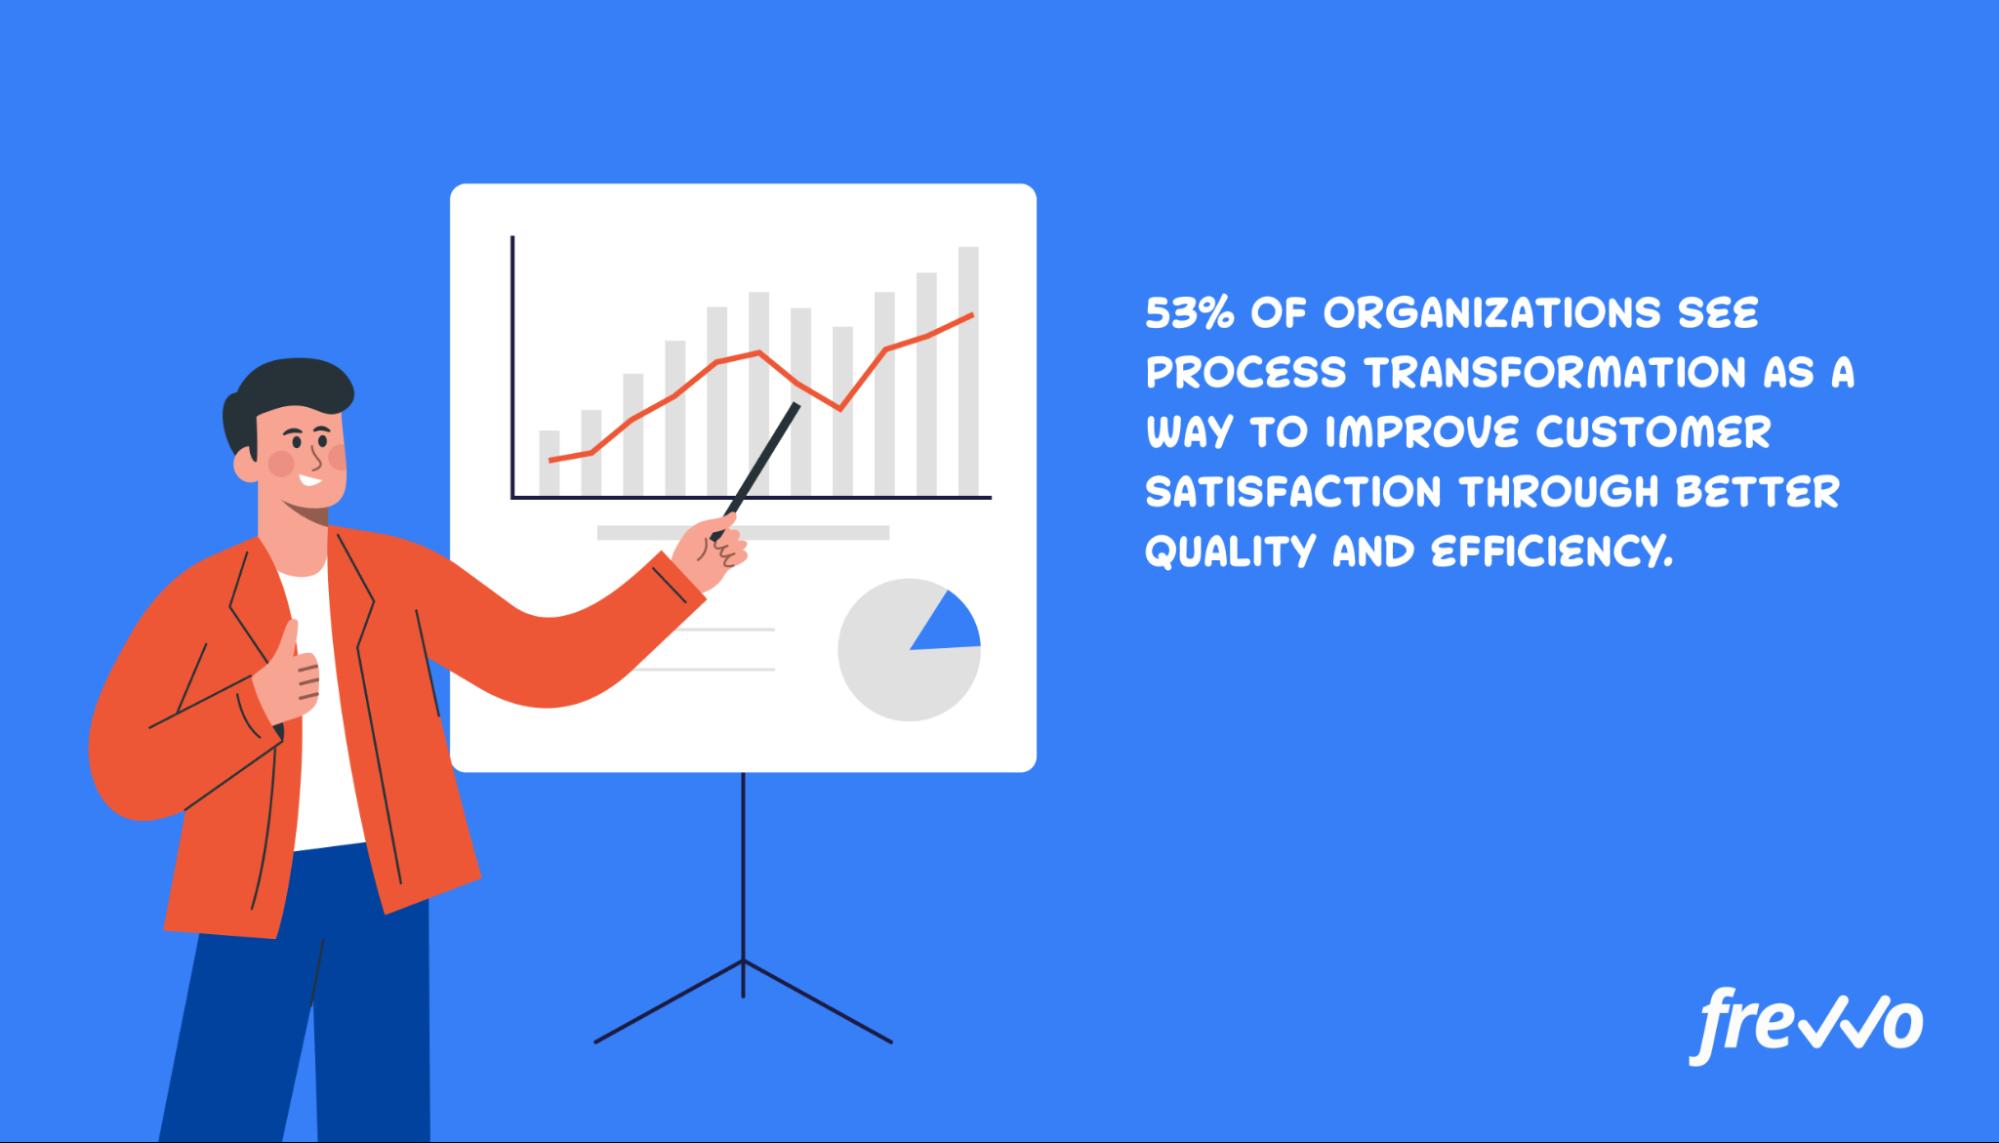 process improvement customer satisfaction statistic